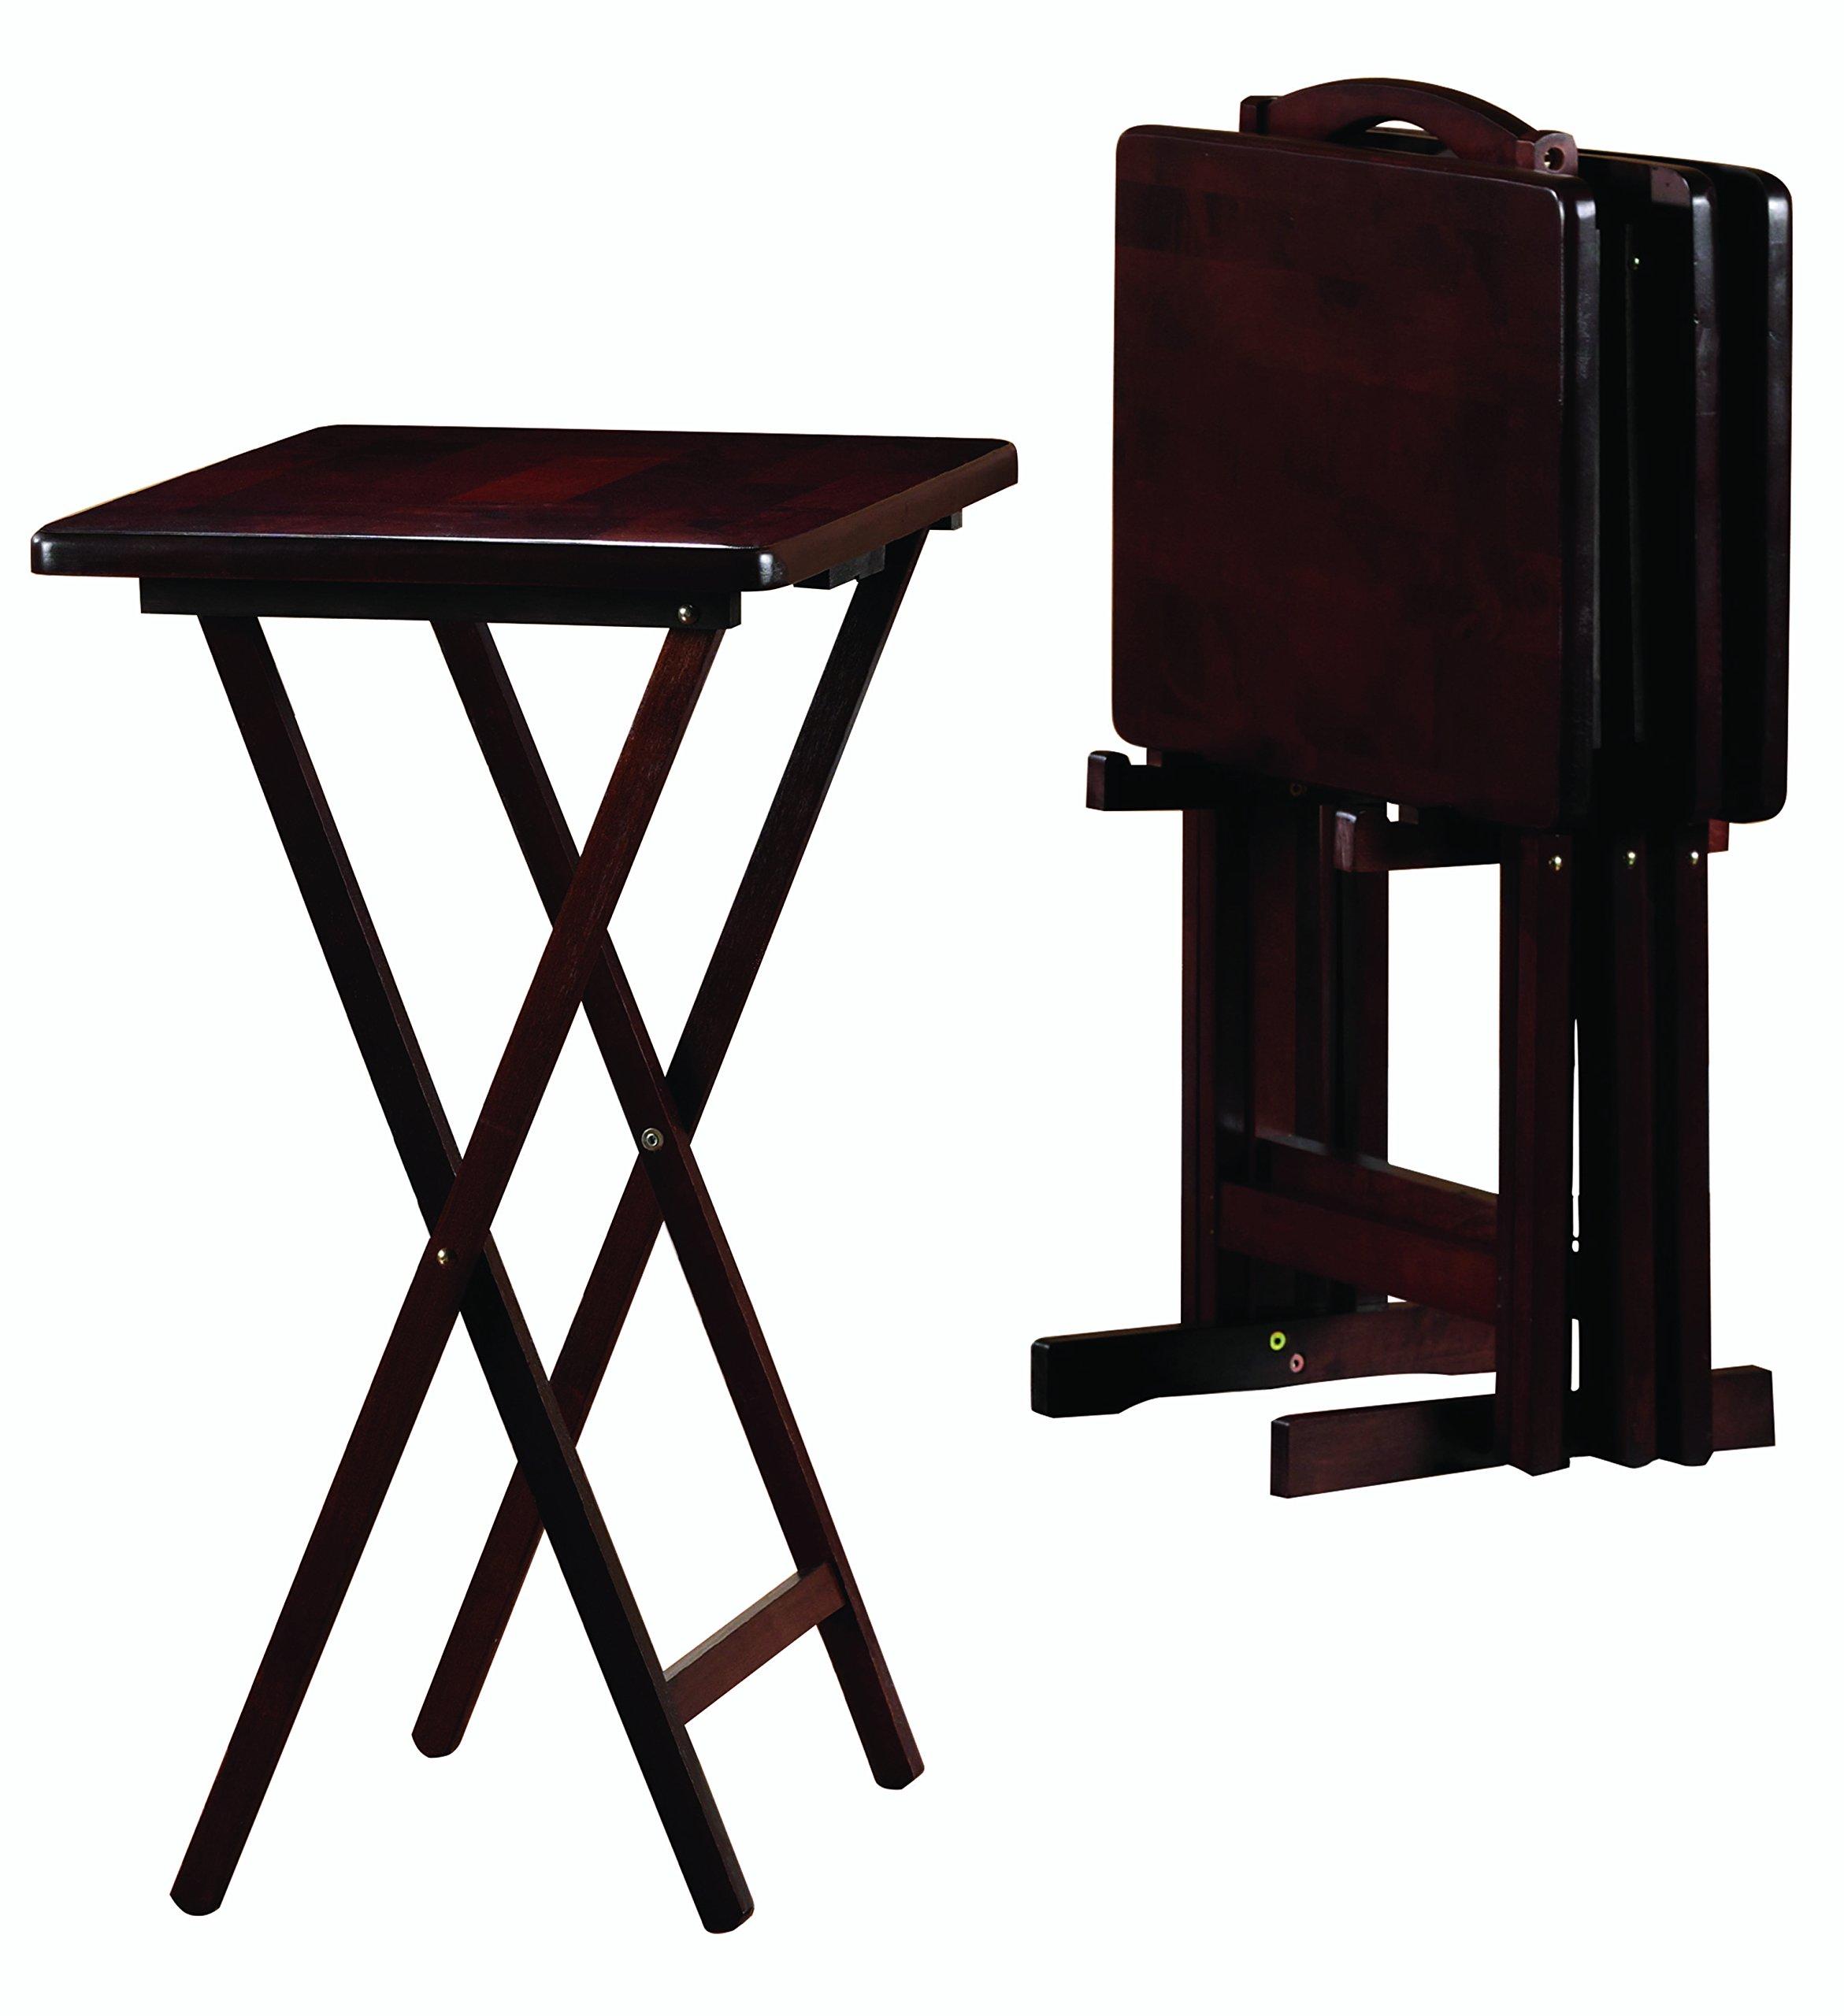 PJ Wood 5-piece Folding TV Tray & Snack Table - Espresso Finish Rubberwood by PJ Wood